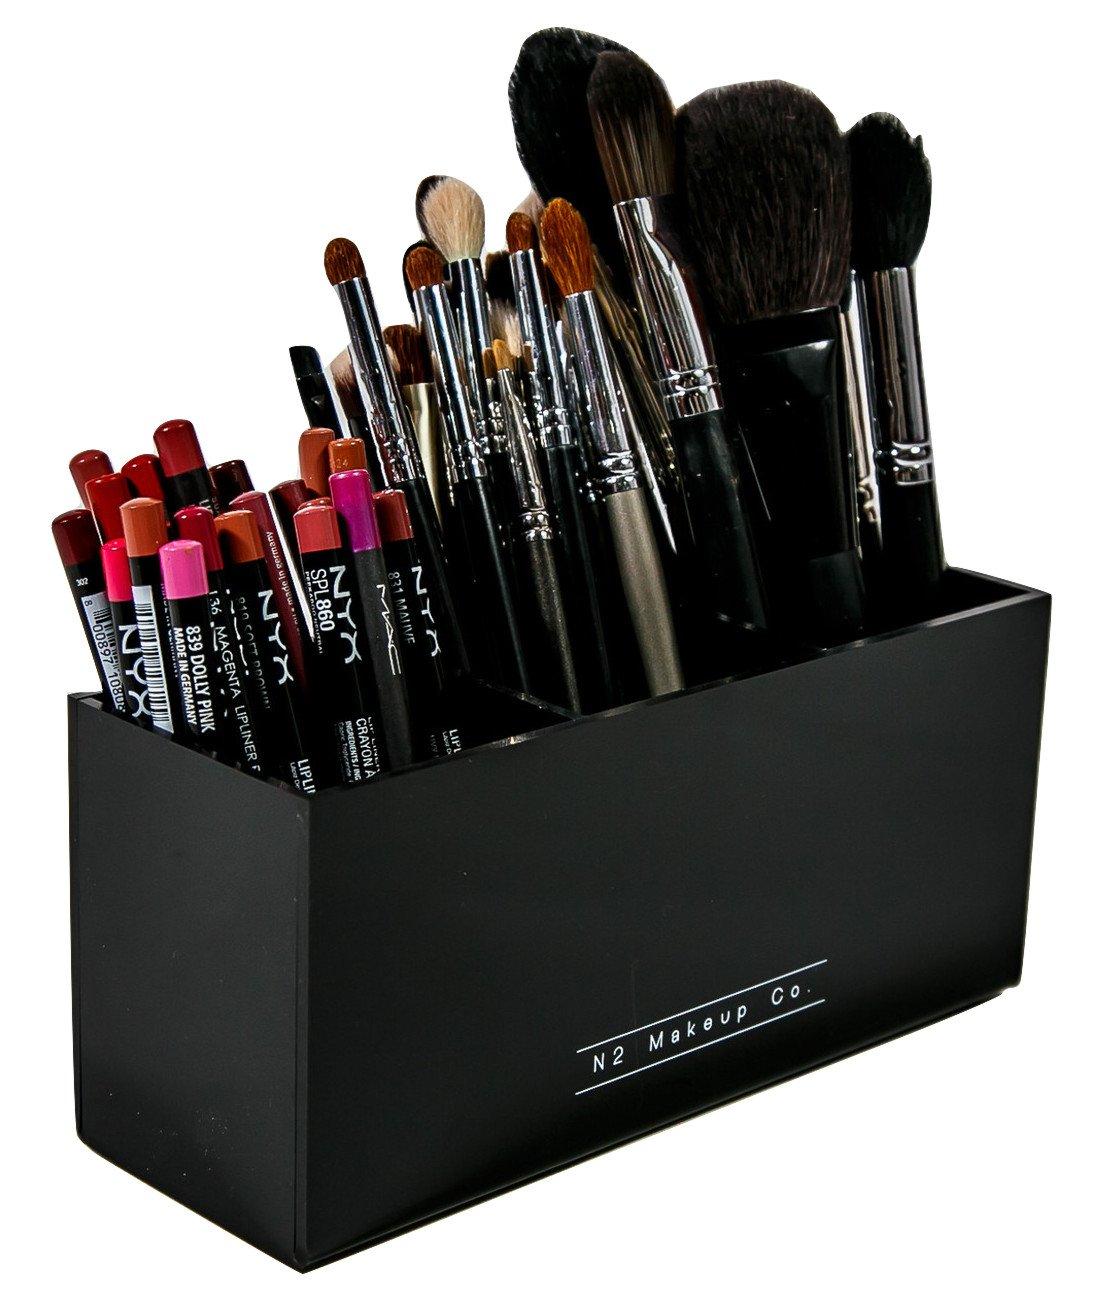 Amazon.com: Makeup Brush Holder Organizer   3 Slot Acrylic Cosmetics  Brushes Storage Solution By N2 Makeup Co: Home U0026 Kitchen